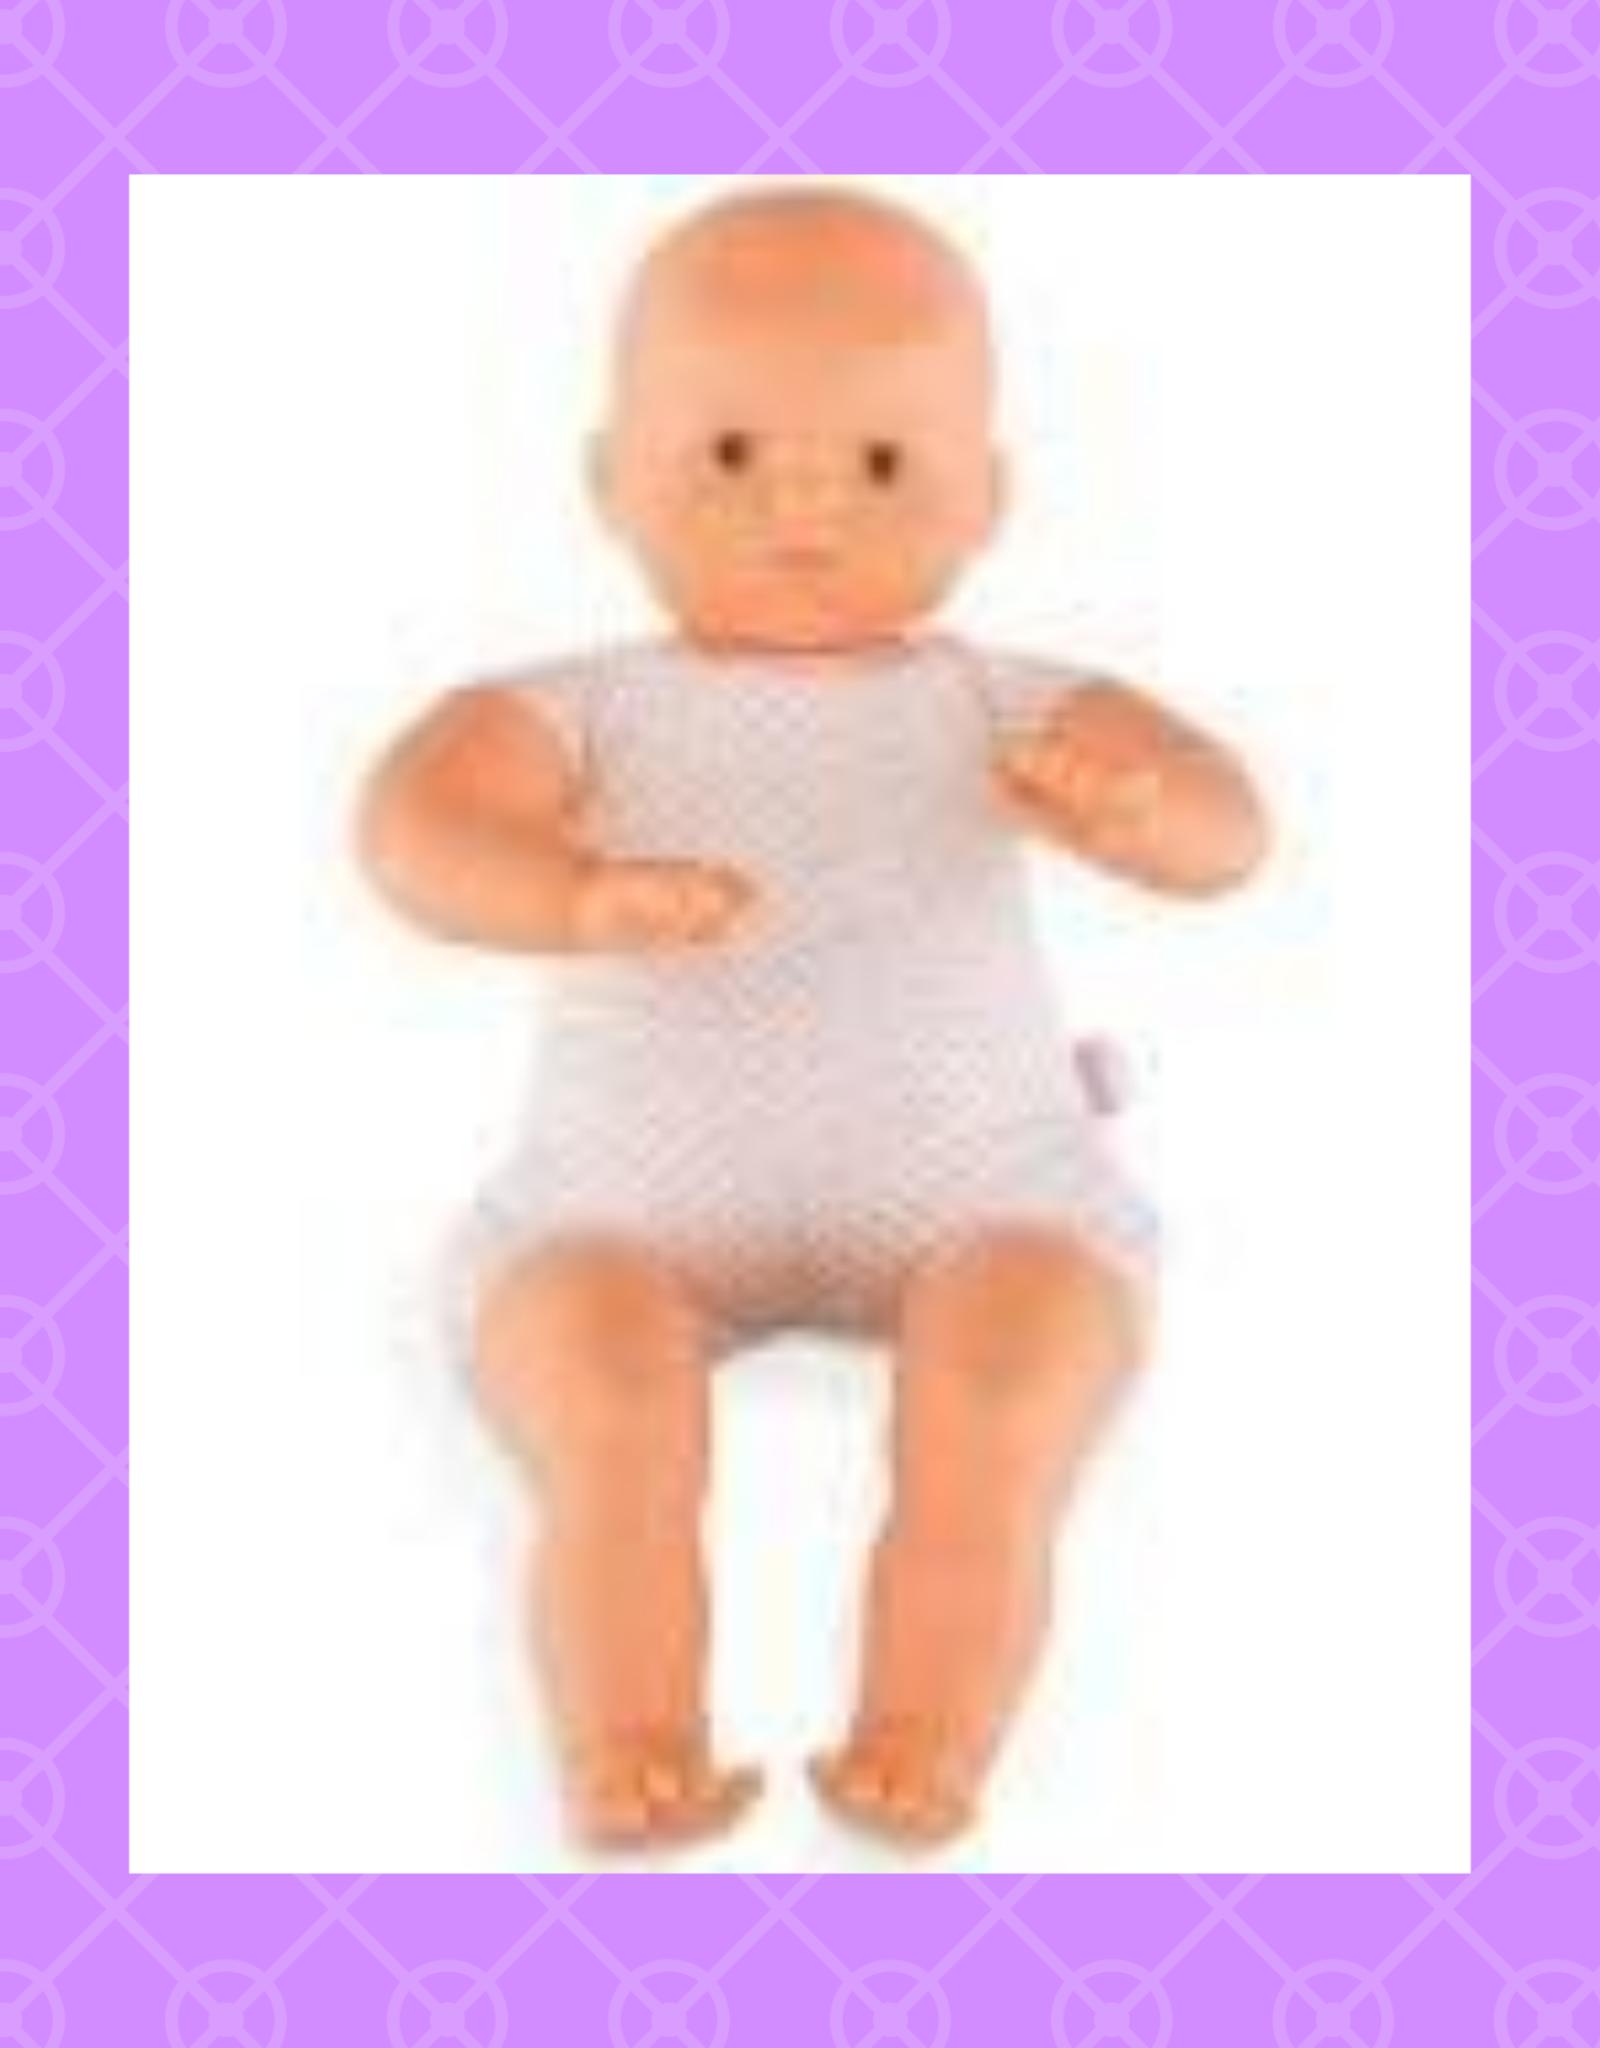 LARGE BABY GRAND POUPON 14